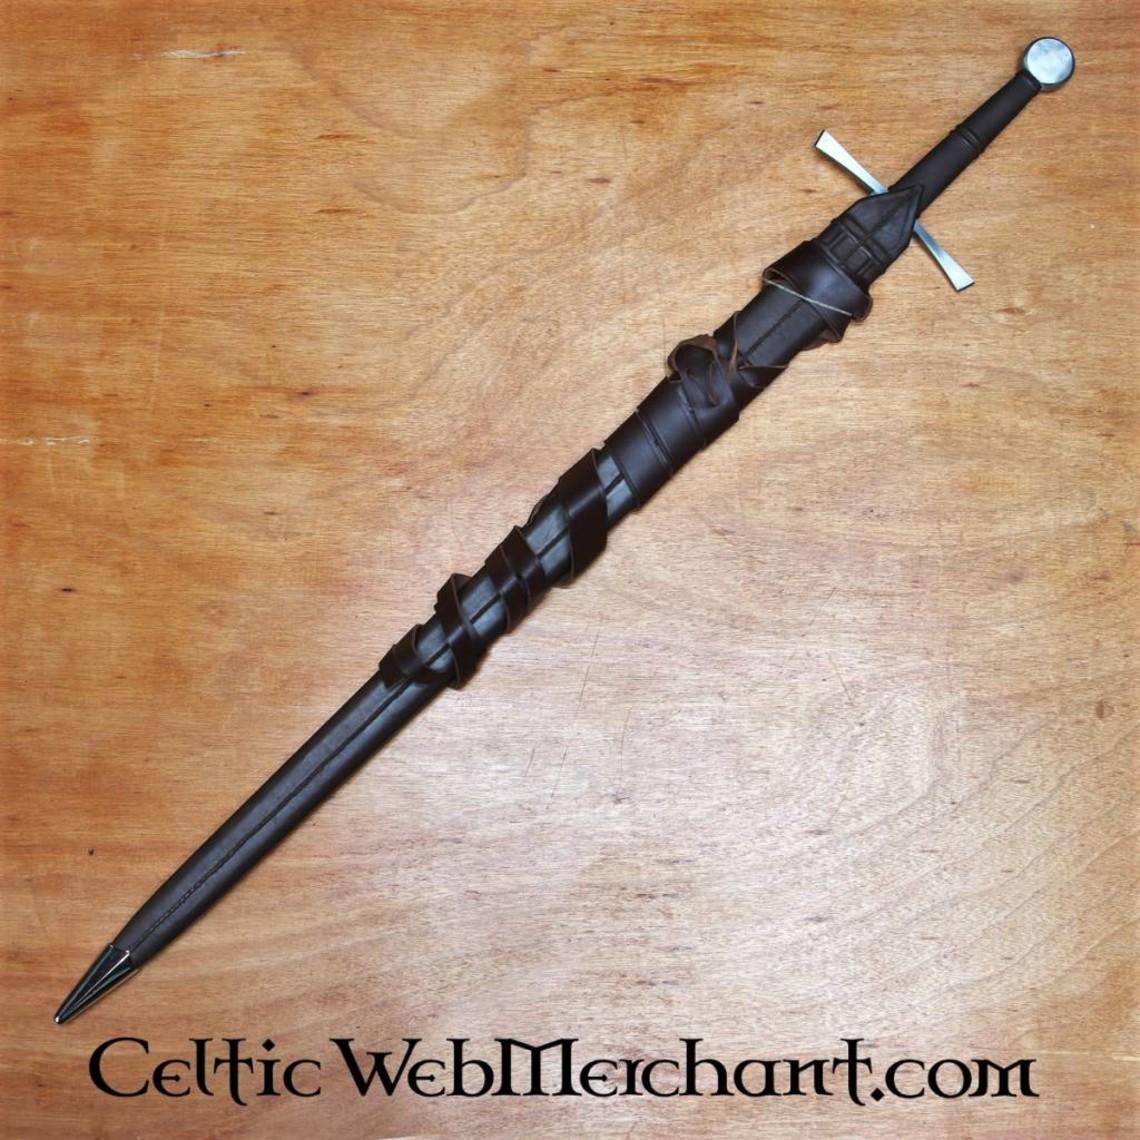 Red dragon Épée bâtarde, trempée